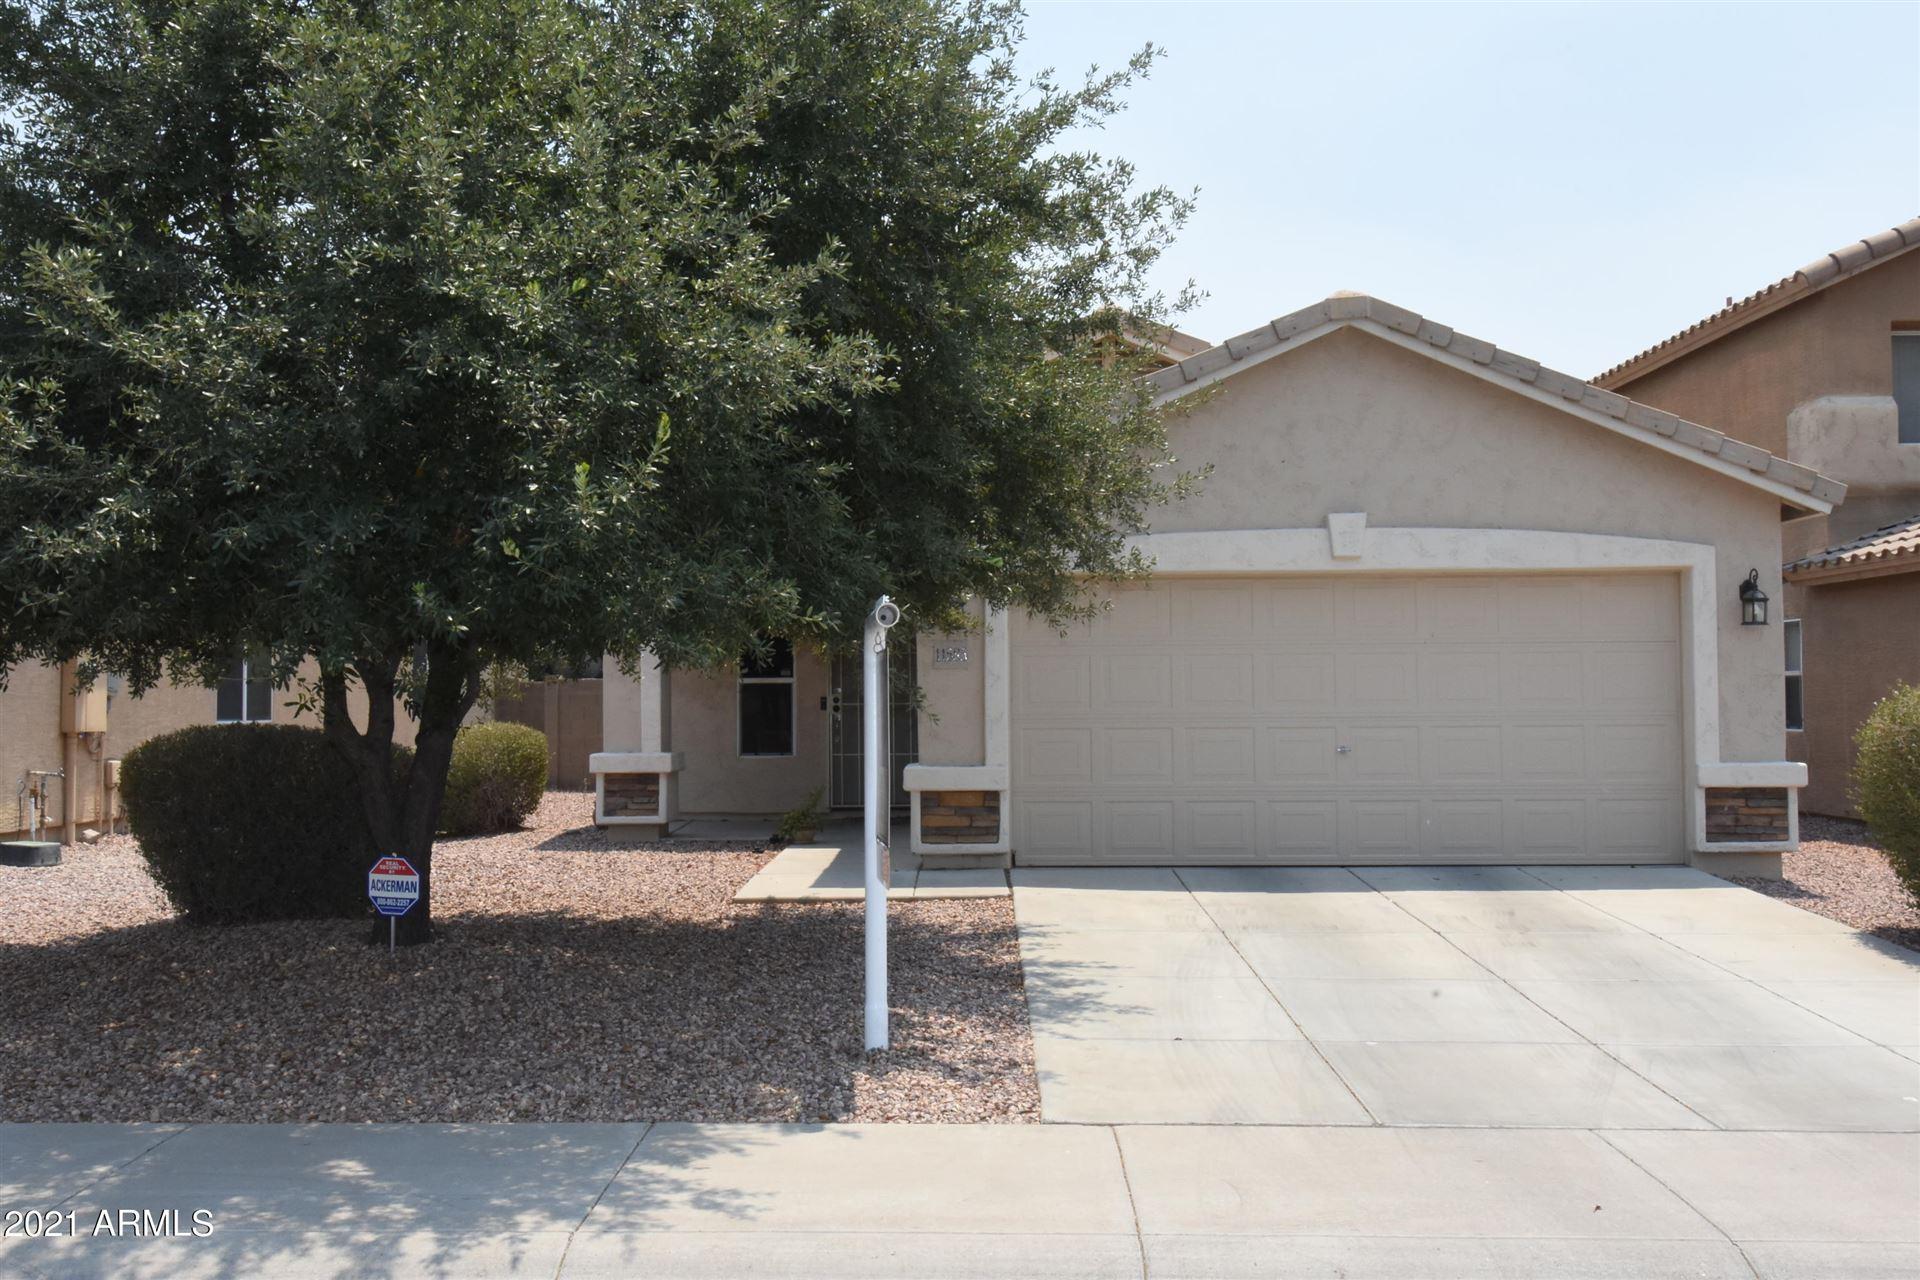 Photo of 11585 W OGLESBY Avenue, Youngtown, AZ 85363 (MLS # 6250772)